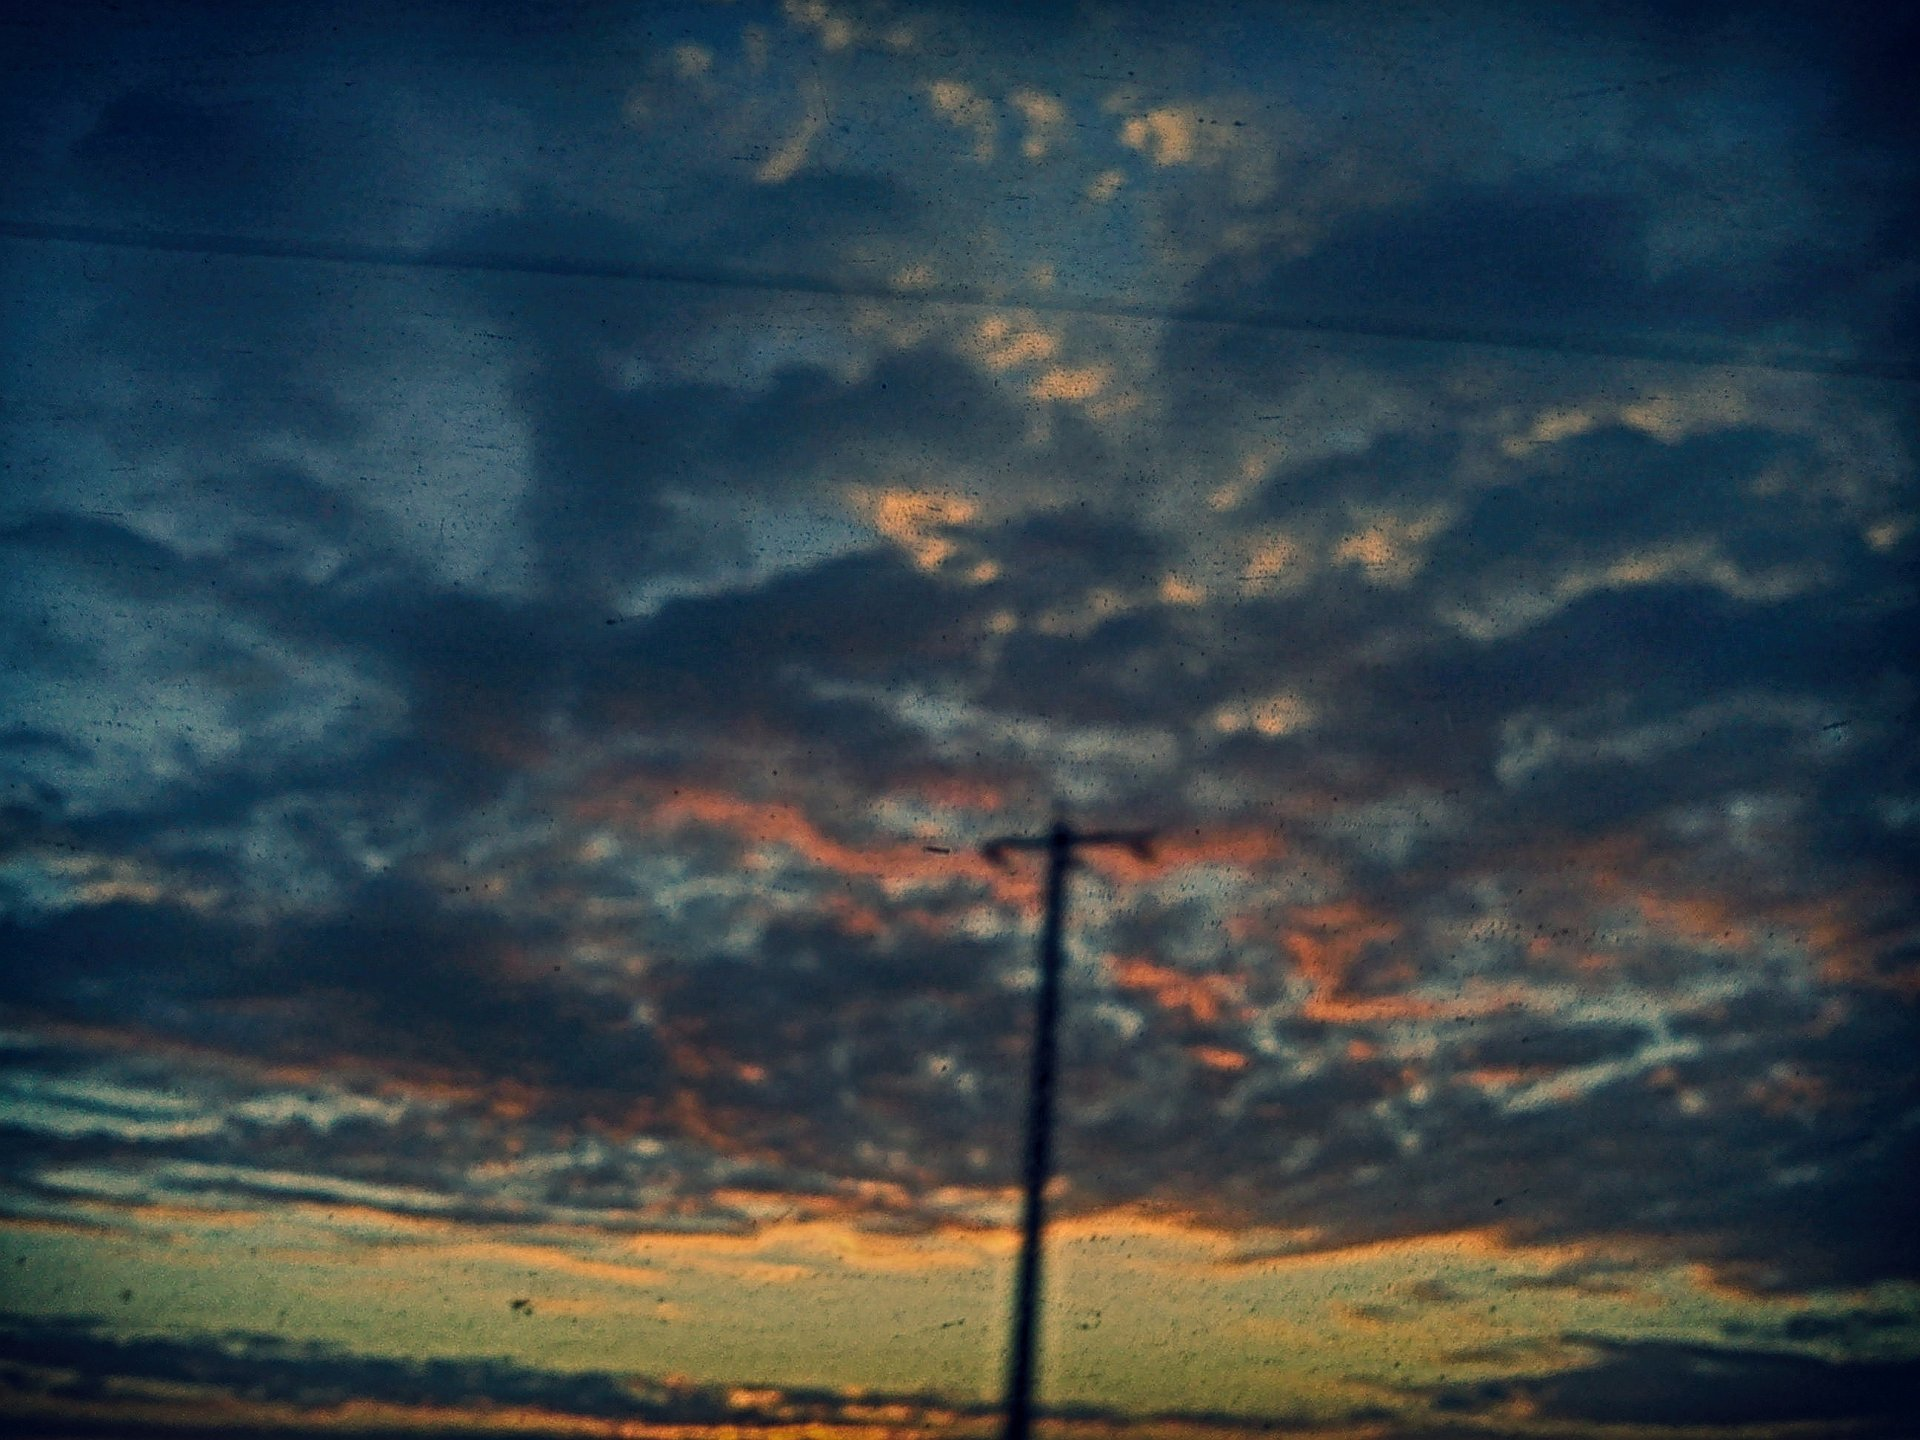 Sunrise in a train to Bucharest